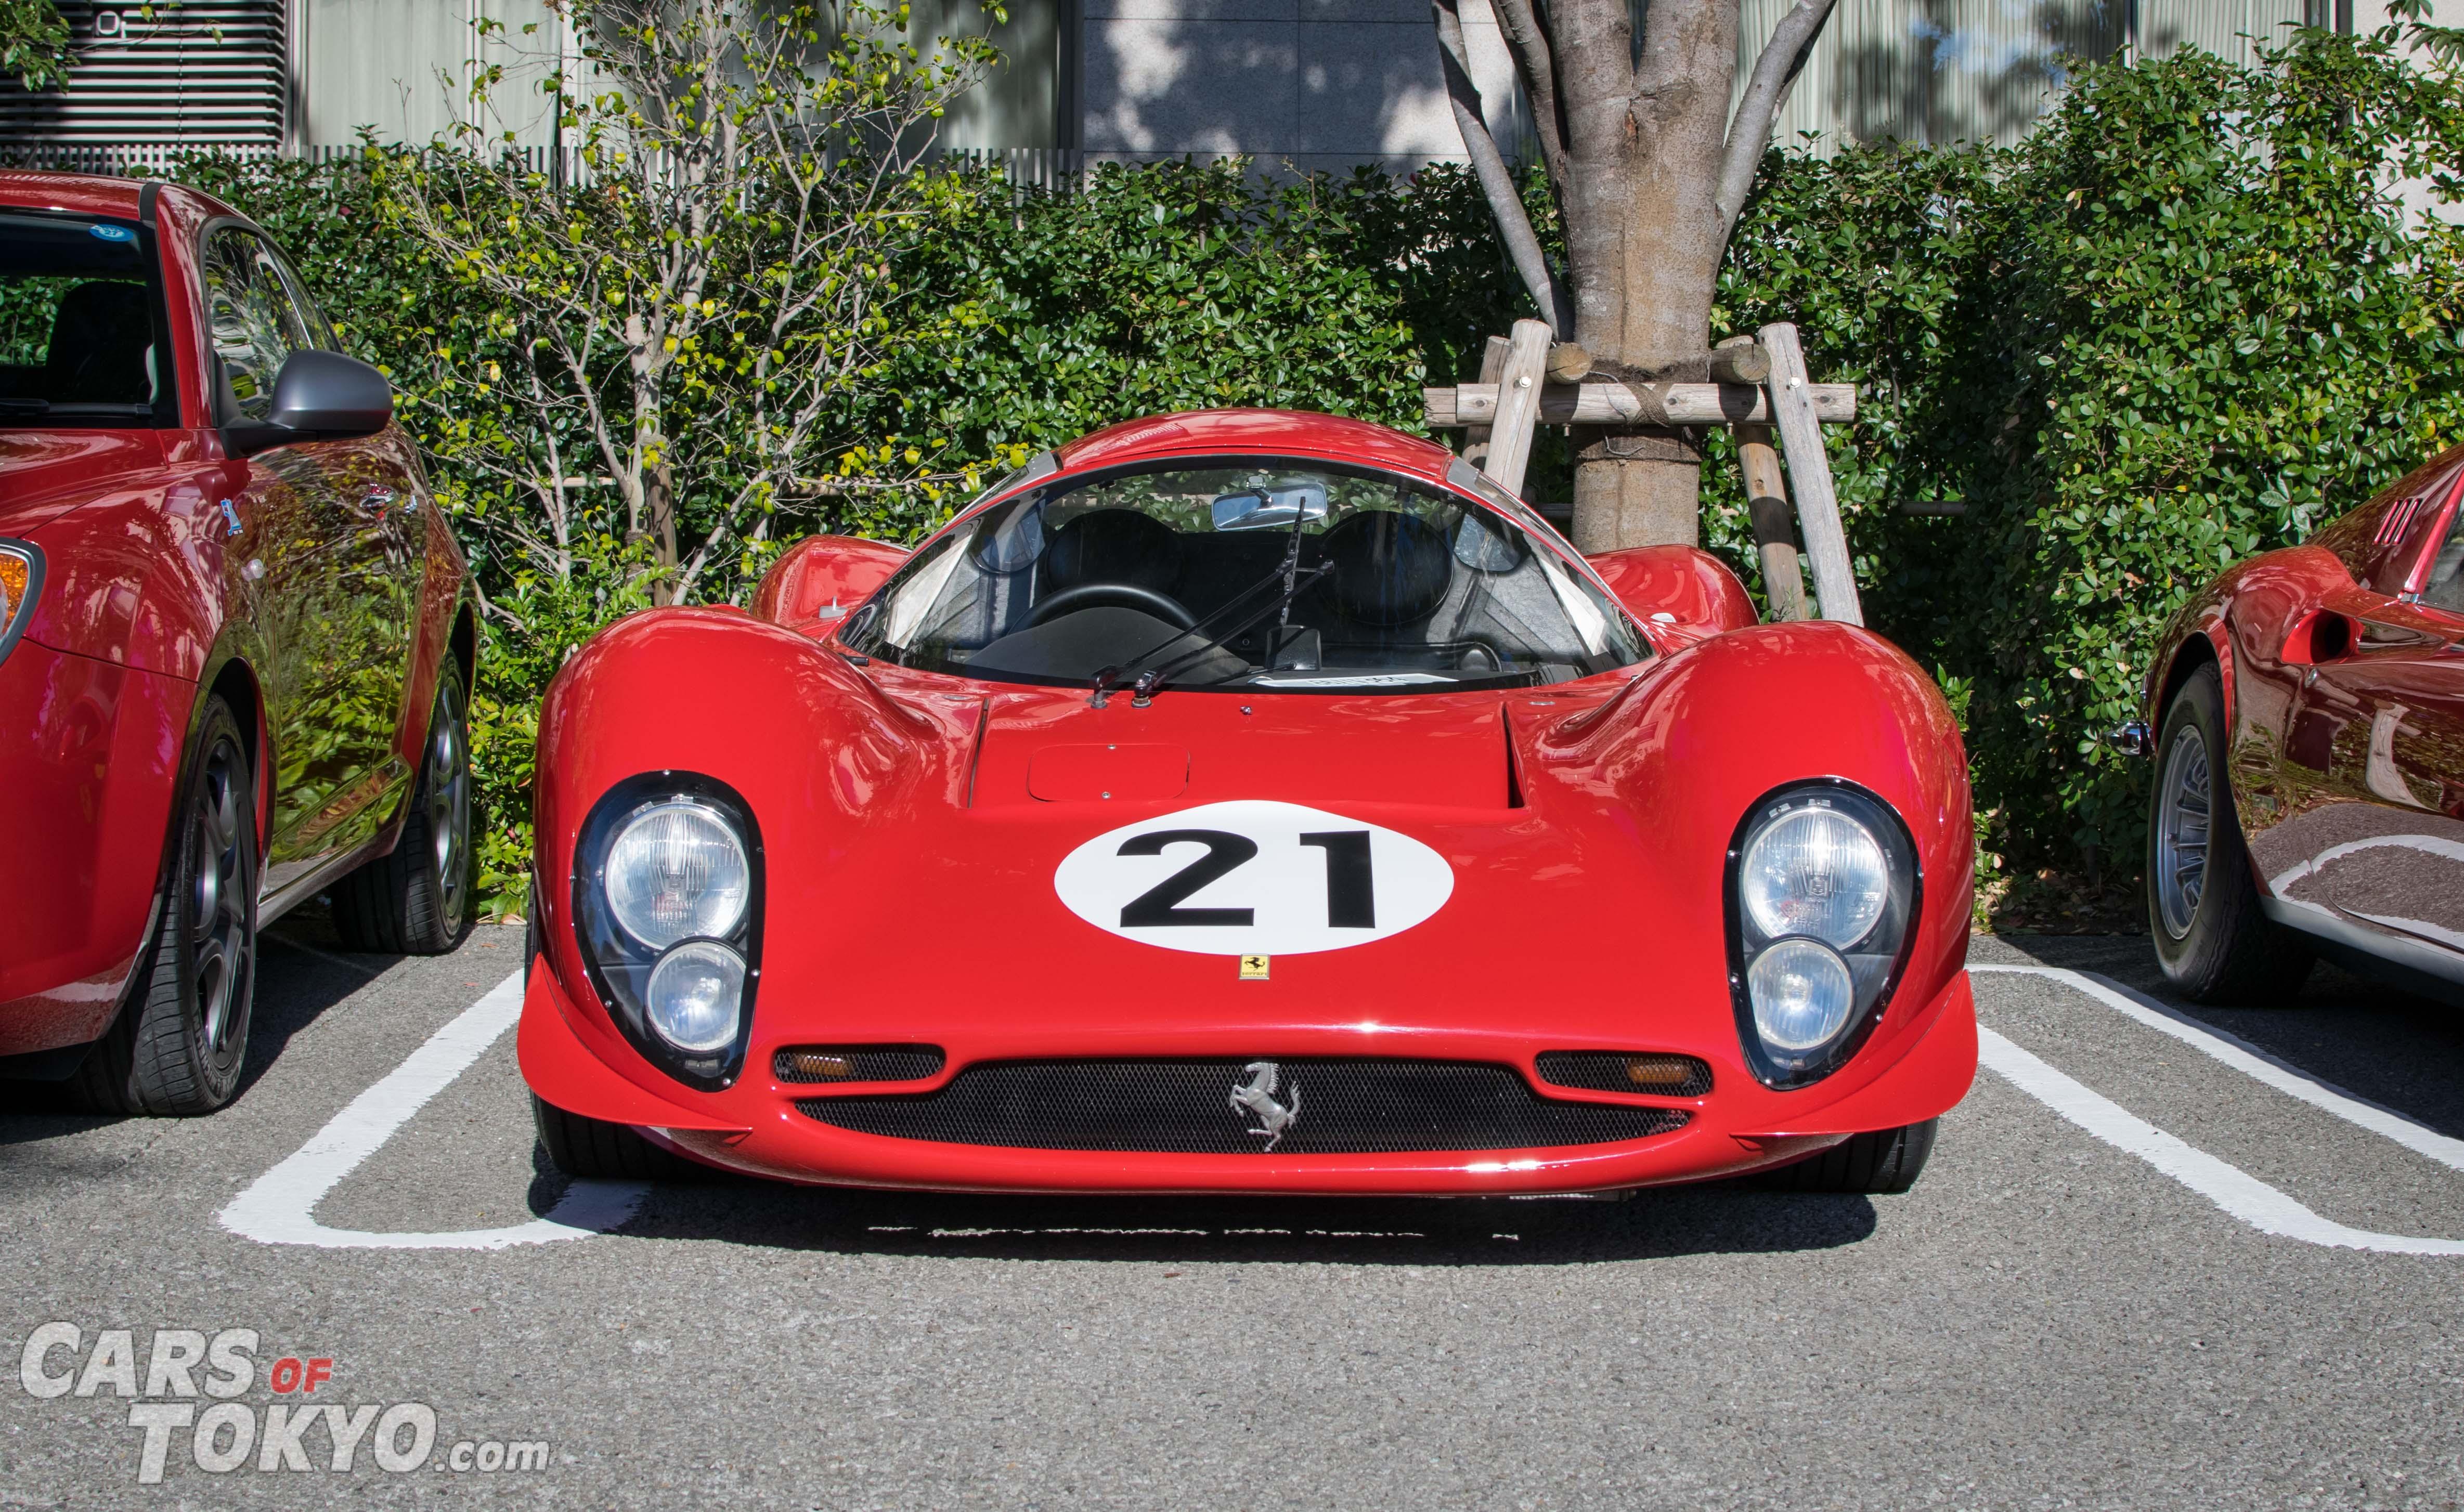 Cars of Tokyo Daikanyama Ferrari 330 P4